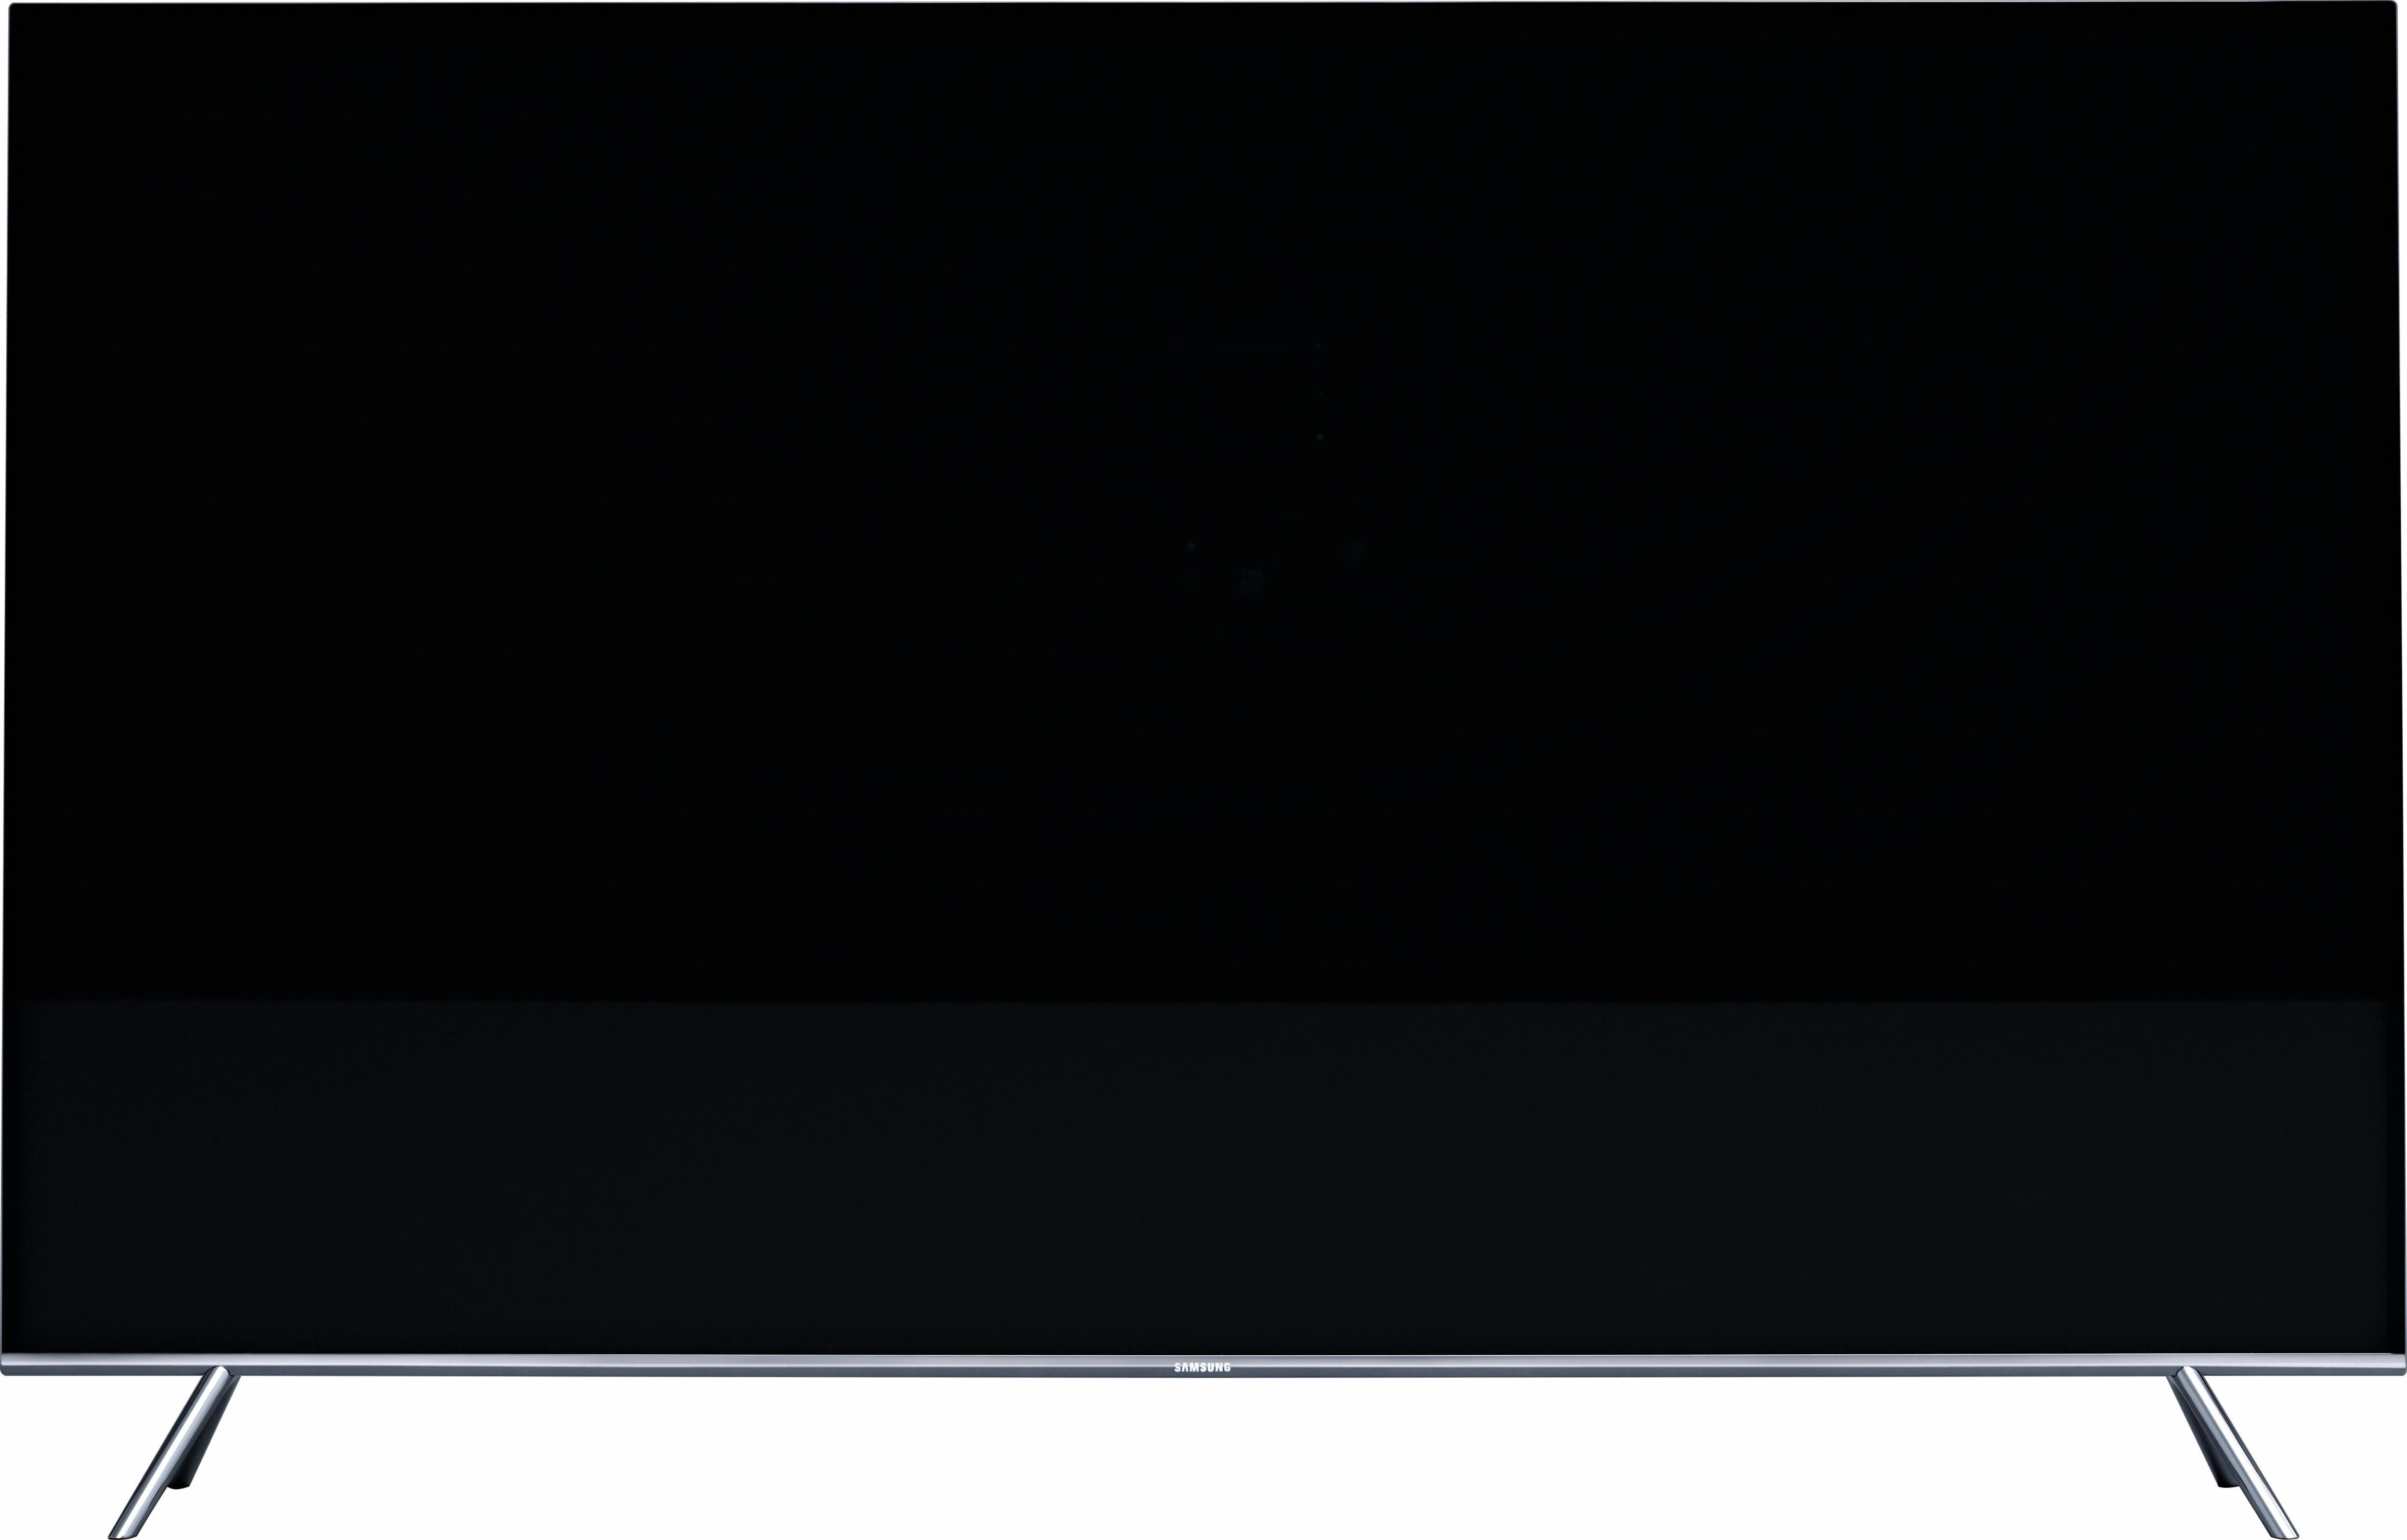 Samsung UE65KS7590UXZG, Curved-LED-Fernseher, 163 cm (65 Zoll), 2160p (SUHD), Smart-TV